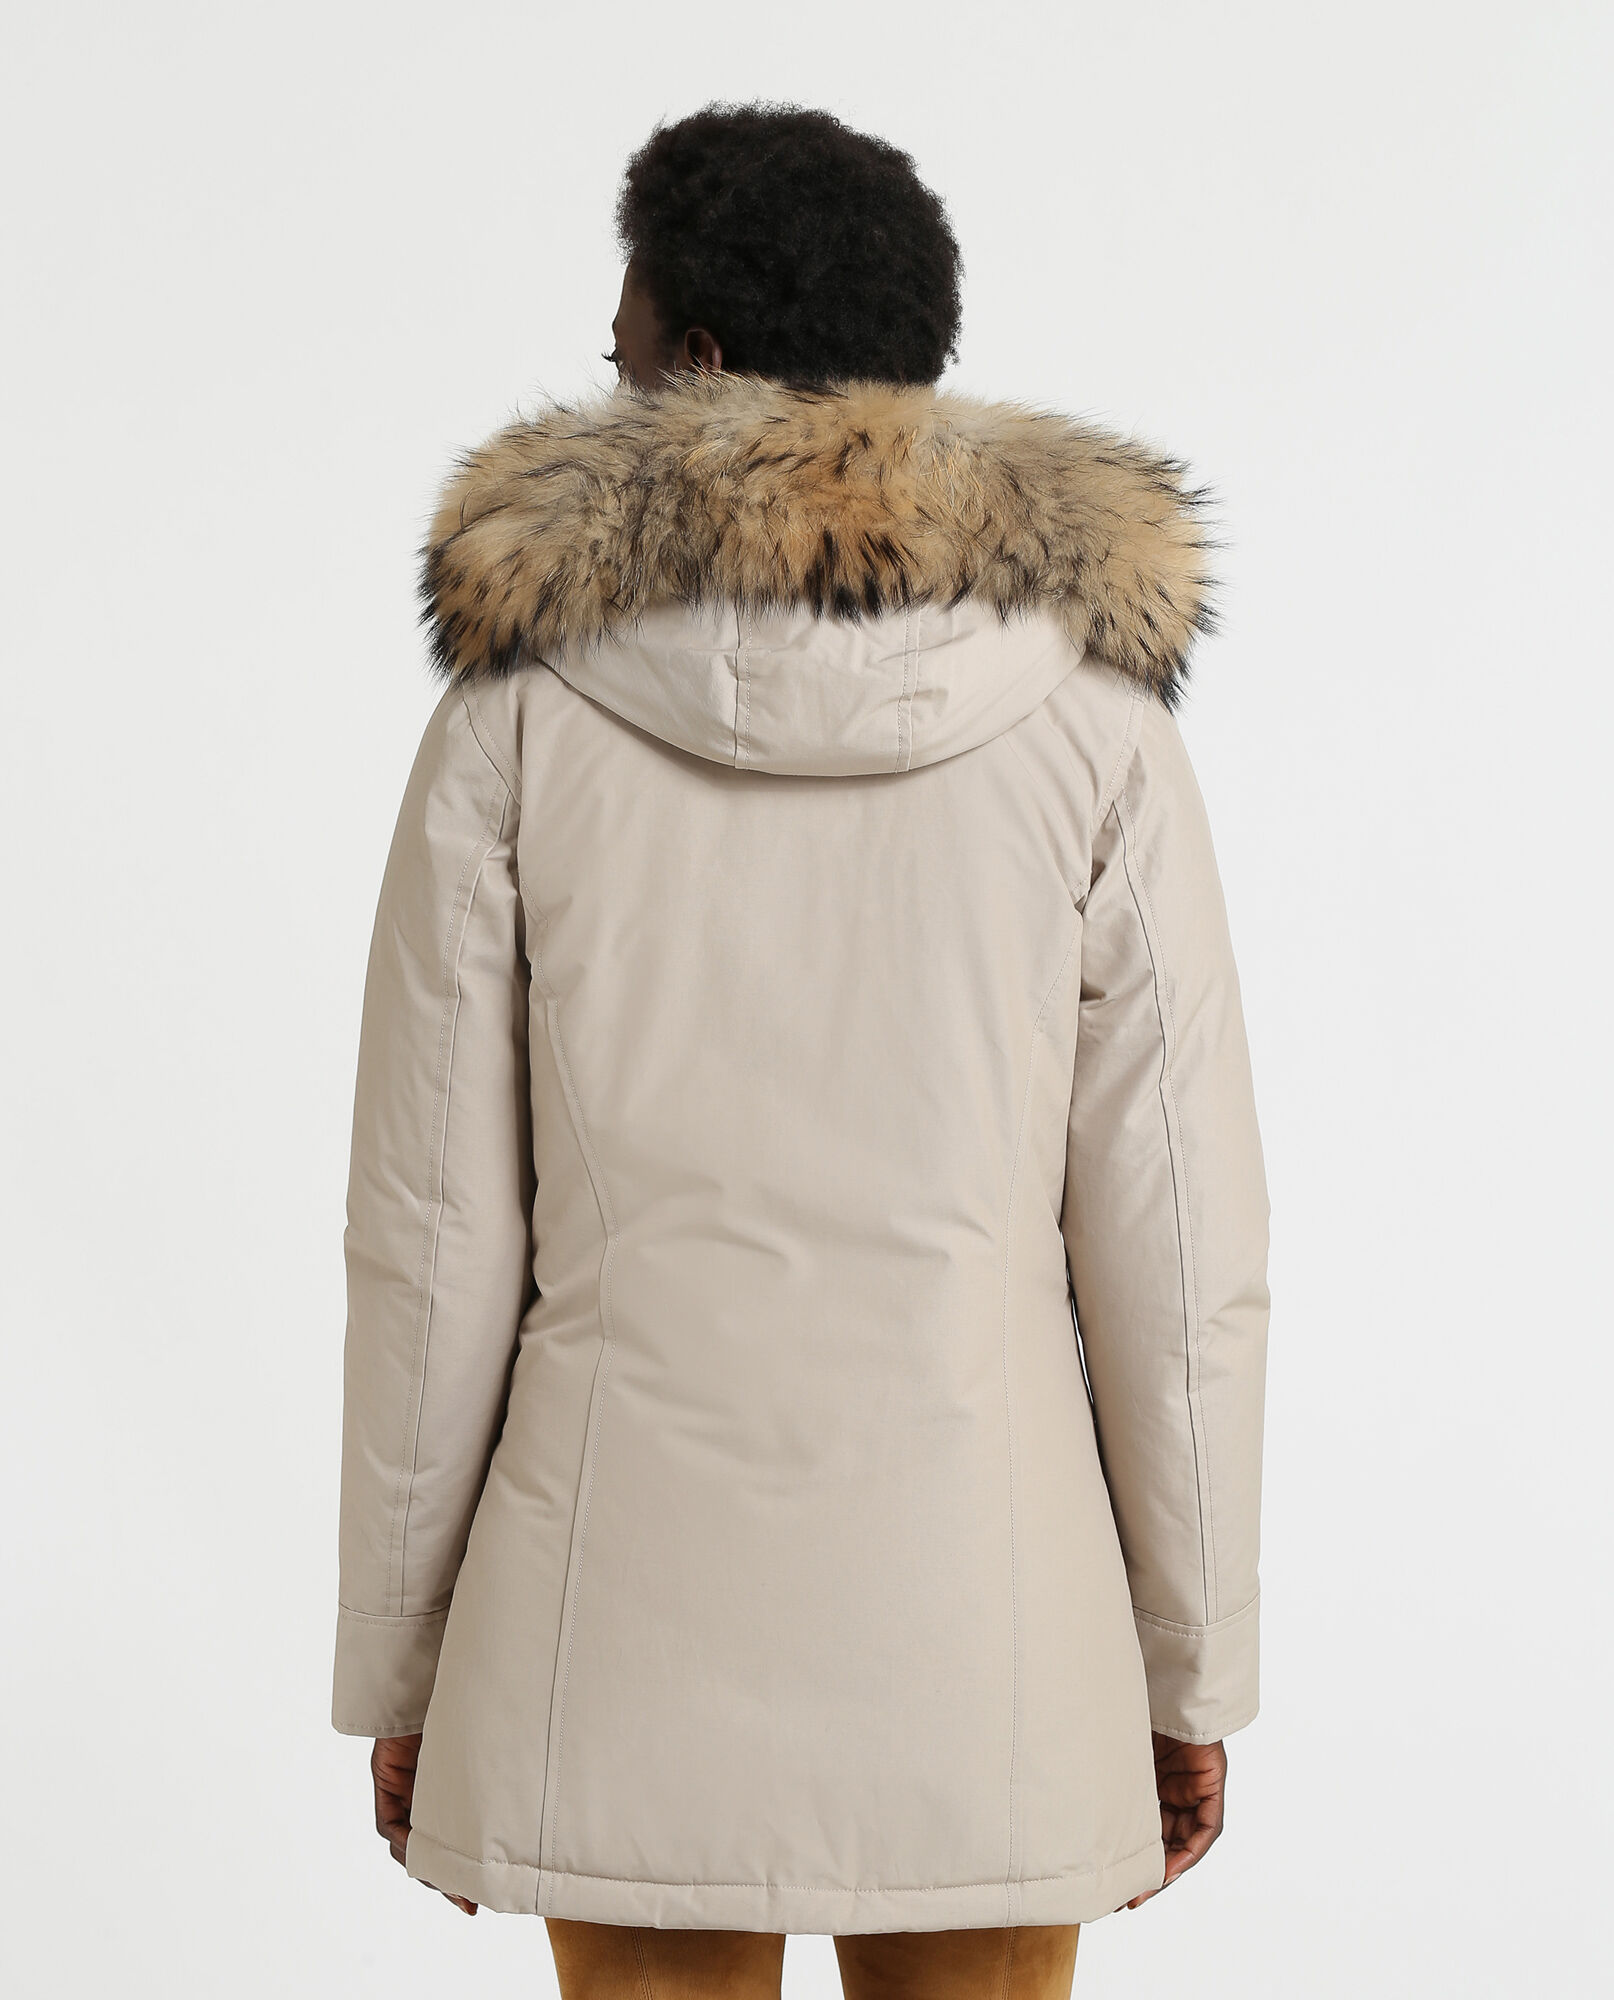 woolrich capospalla outerwear w\u0027s arctic parka fr wwcps1447 cn021225564 Woolrich Clothes Uk #20